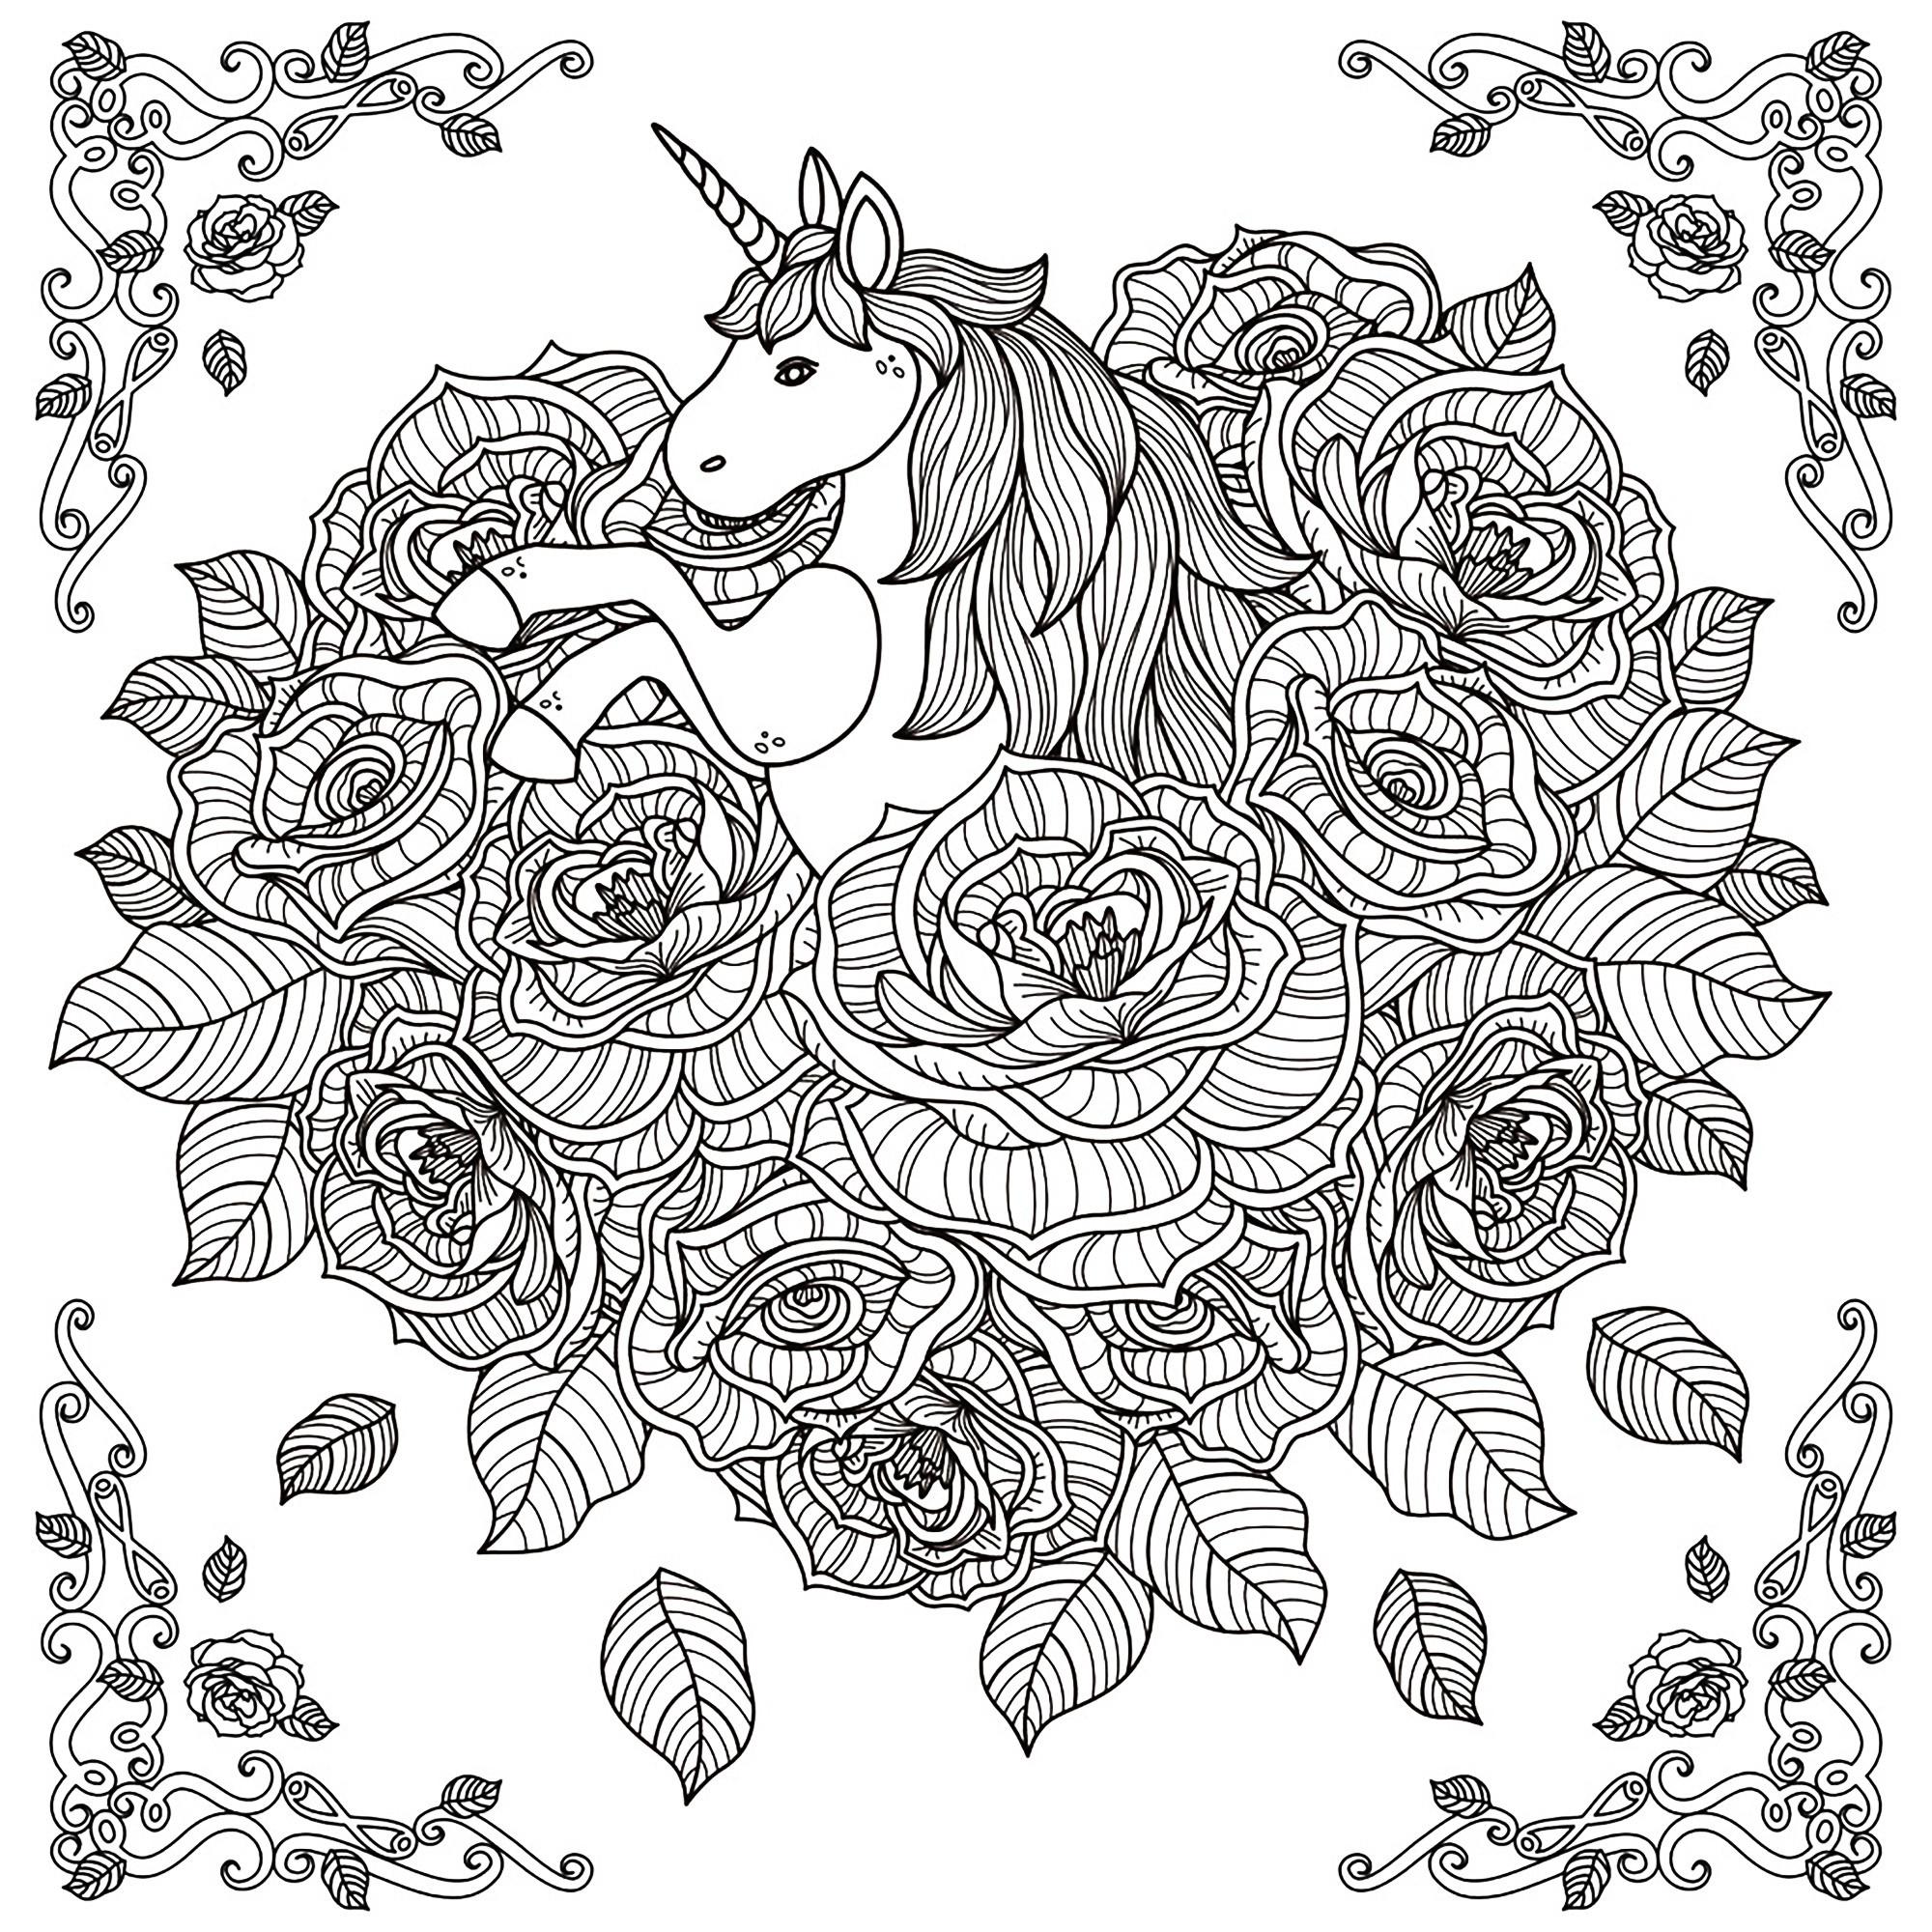 Adult Coloring Pages Unicorn  Unicorn mandala Unicorns Adult Coloring Pages